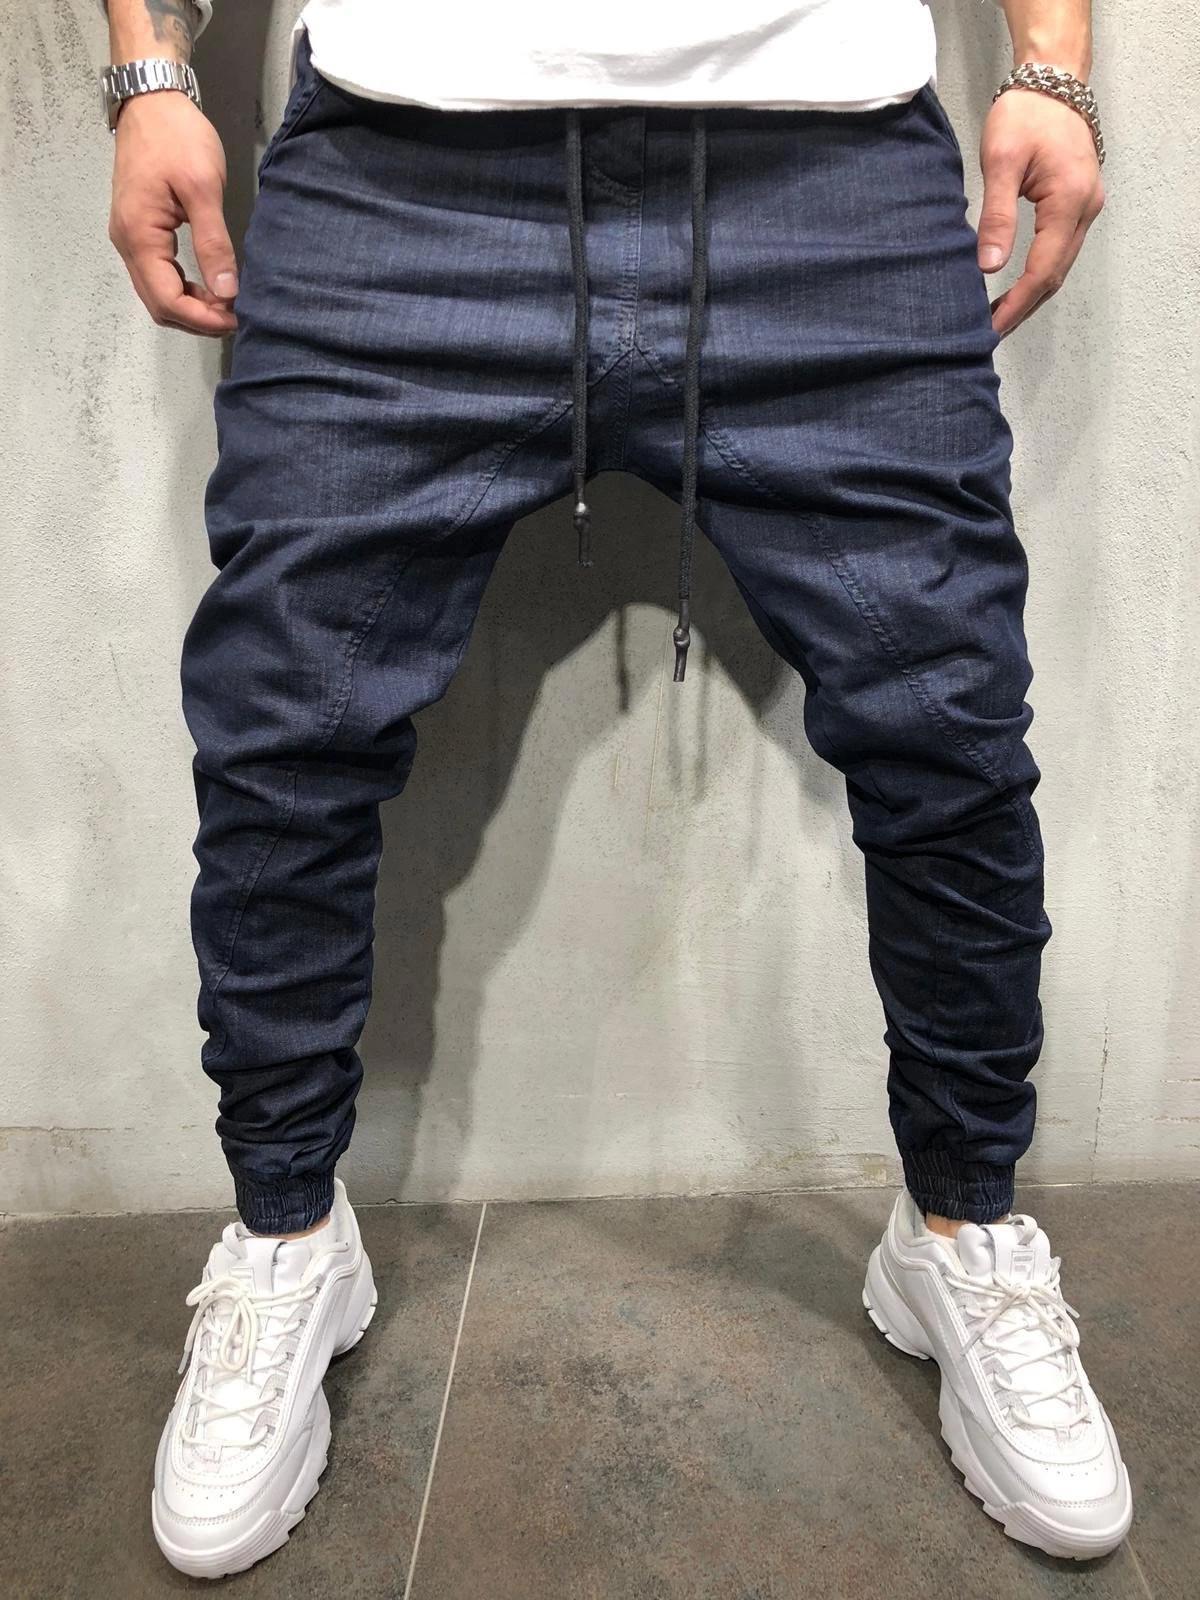 Men's Casual Denim Pants Cargo Slim Stretch Jeans